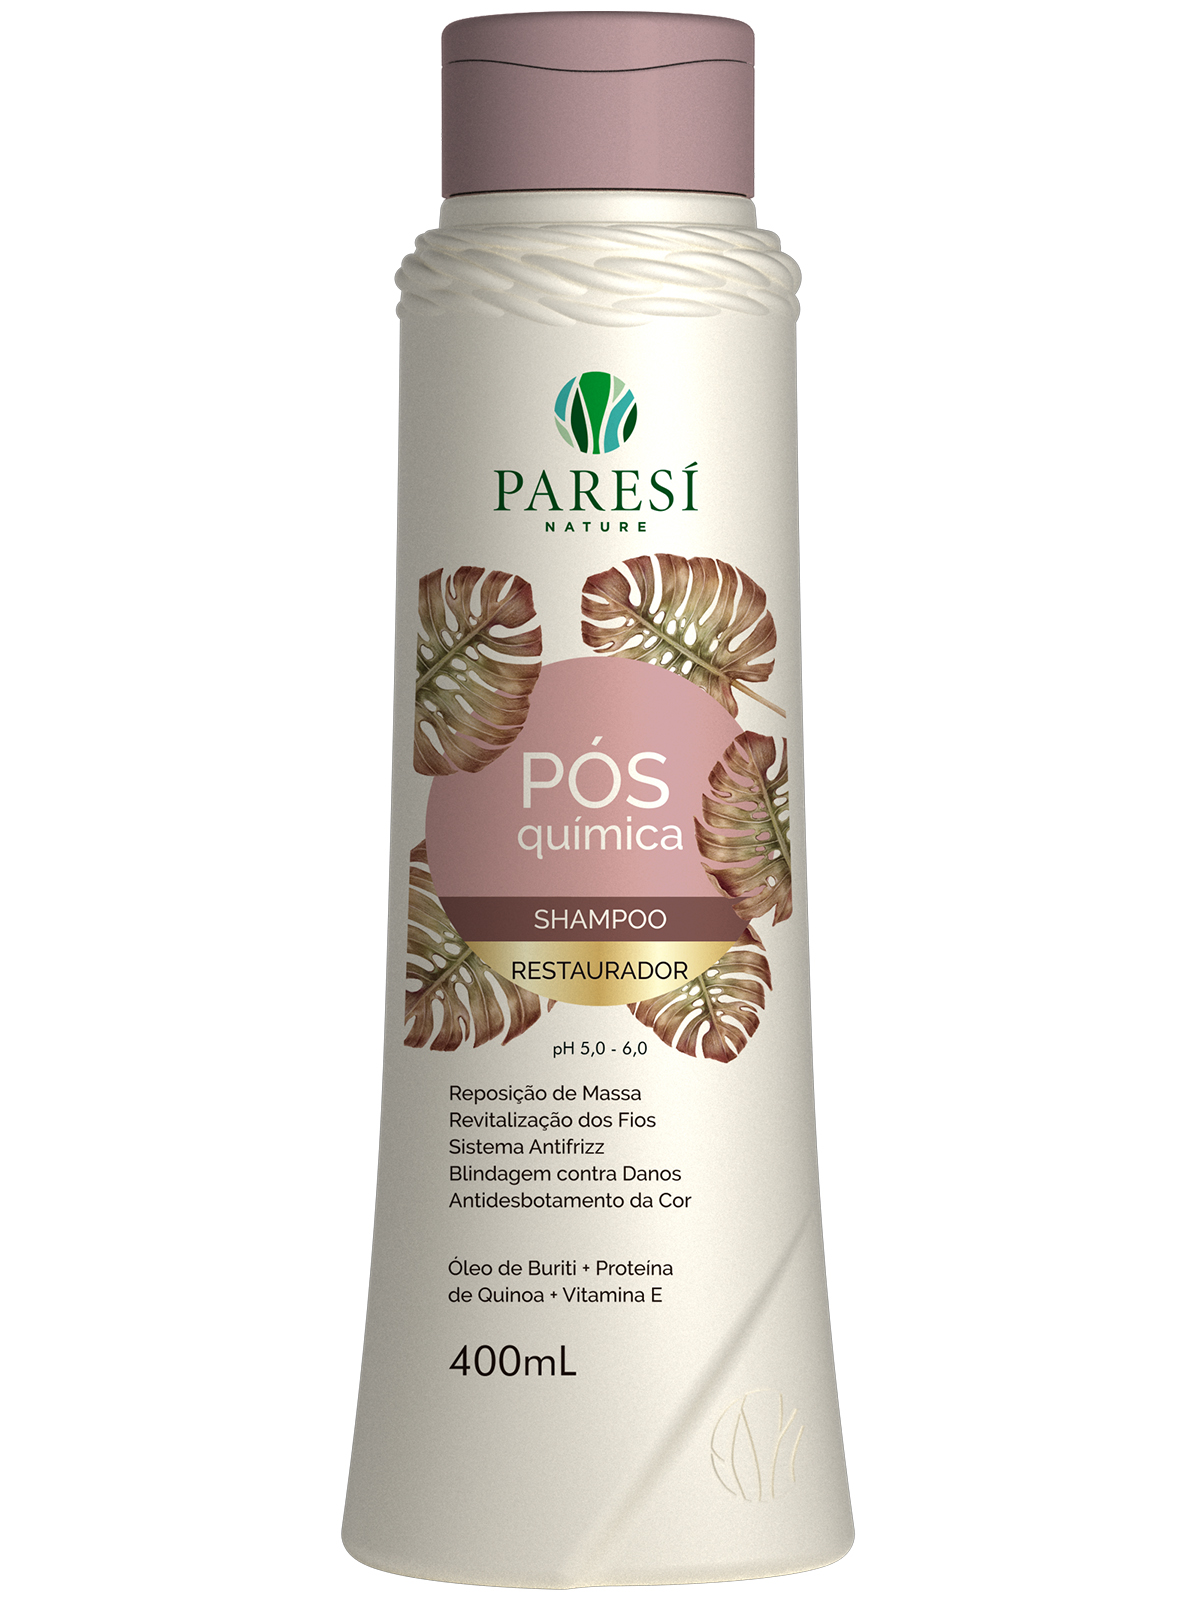 Shampoo Pós Química - Paresí Nature